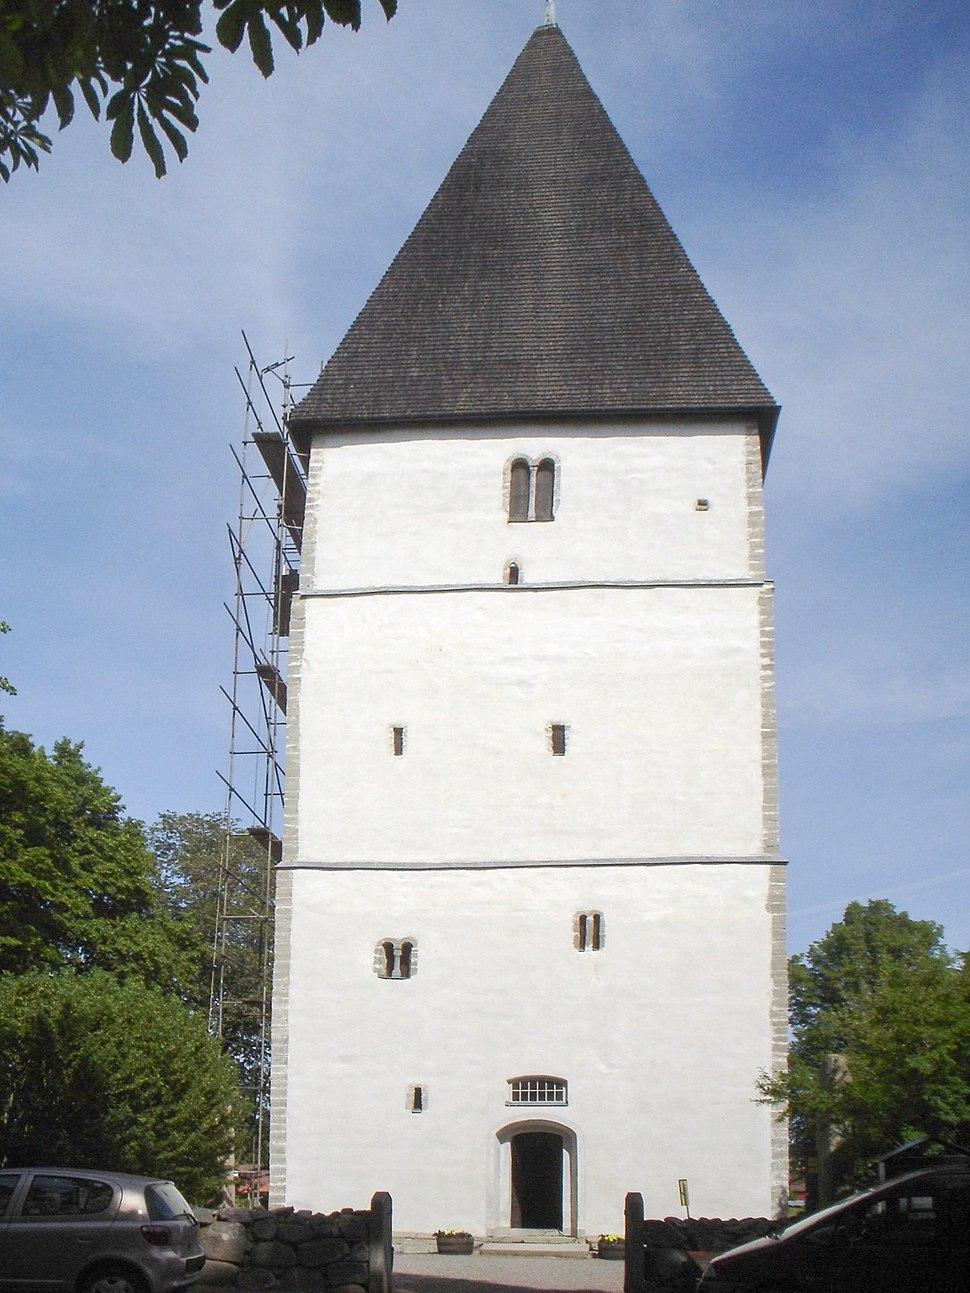 Bjalbo kyrktorn